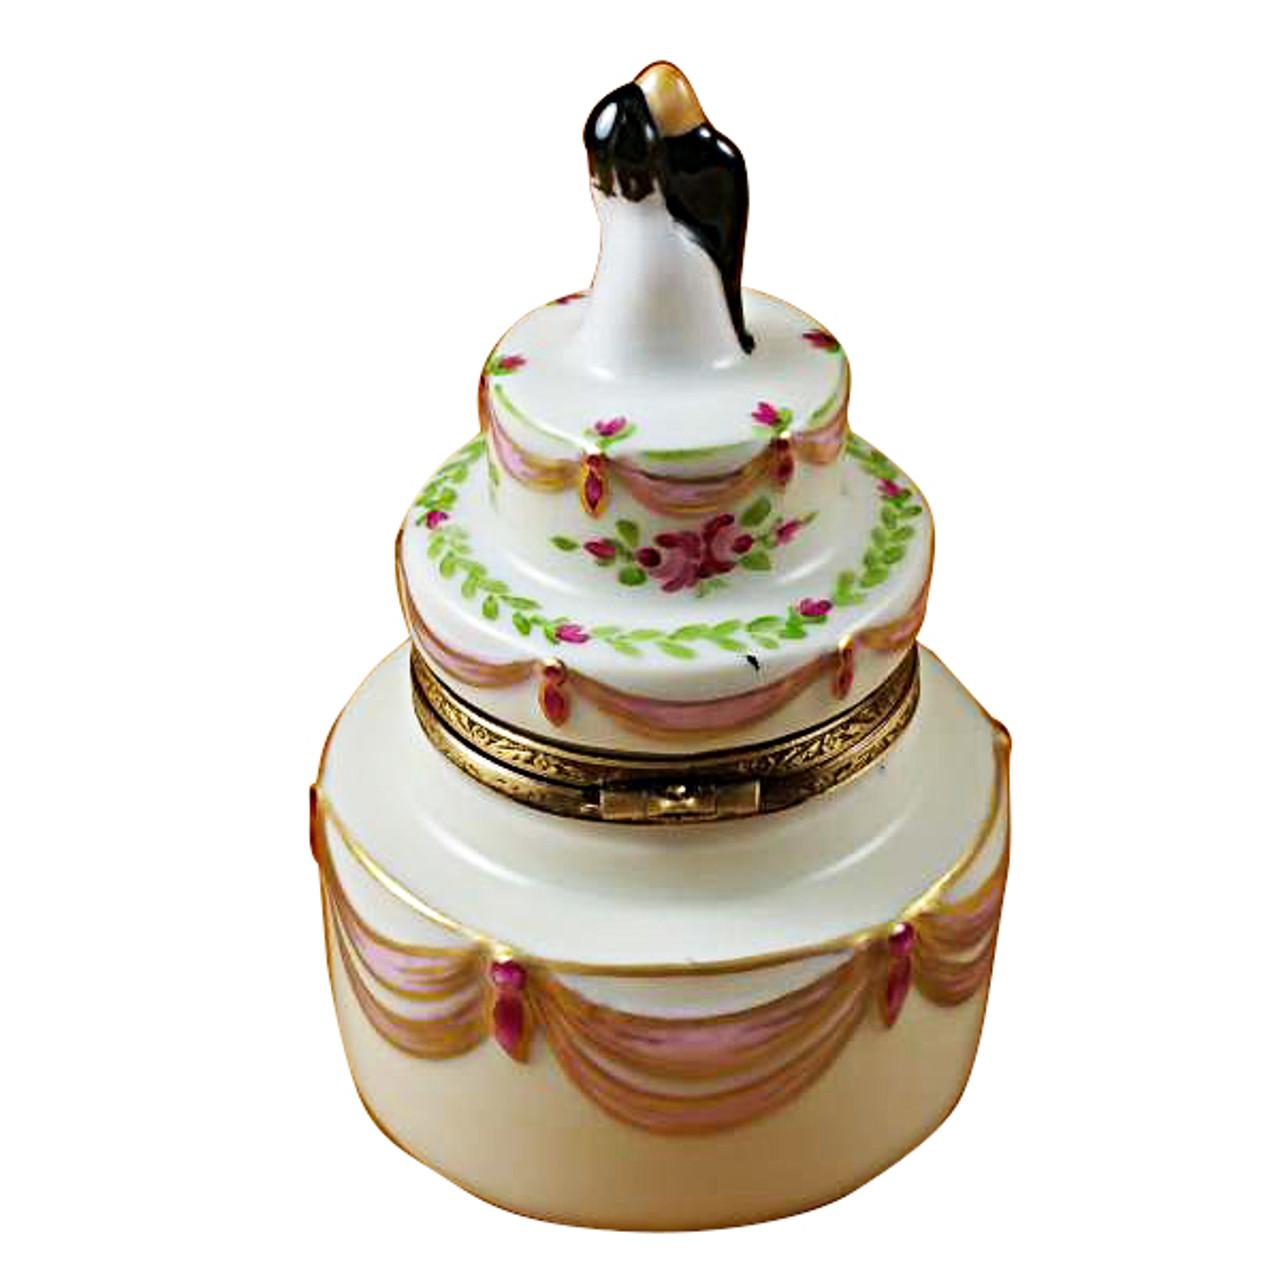 Limoges Imports Bride & Groom Wedding Cake Limoges Box